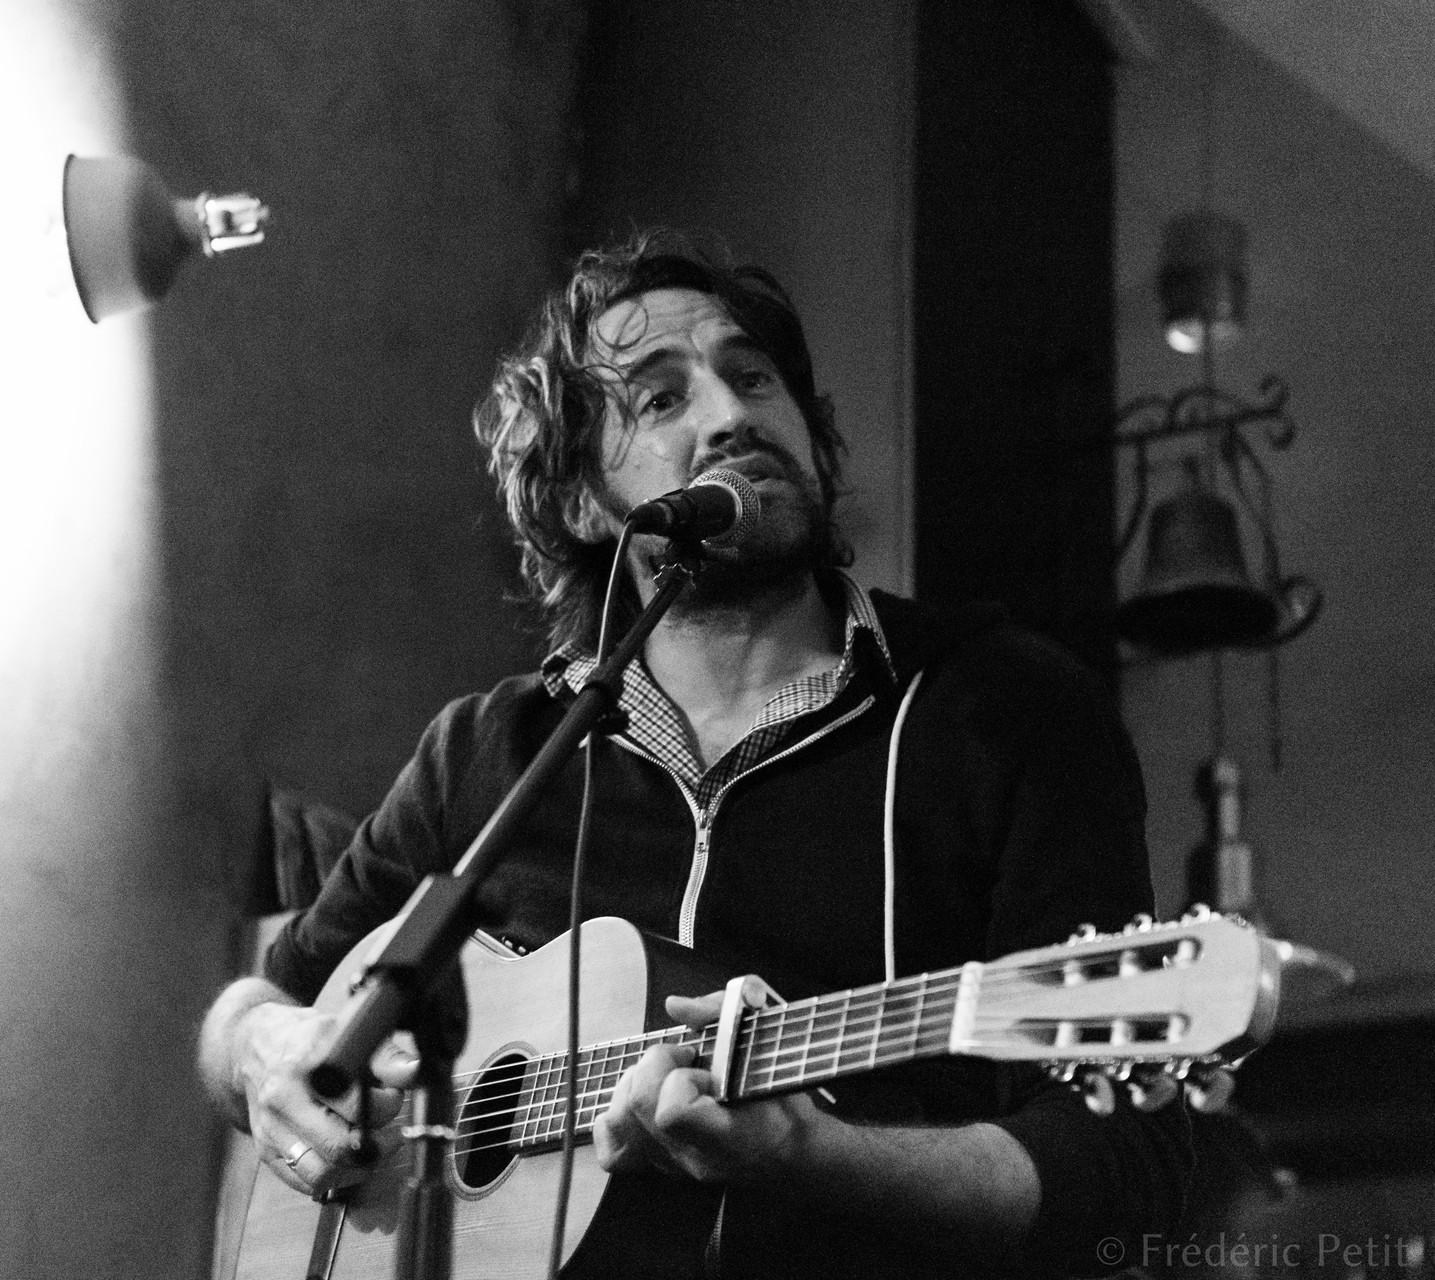 24 novembre 2015 - Sébastien Lacombe @ La Folie Douce